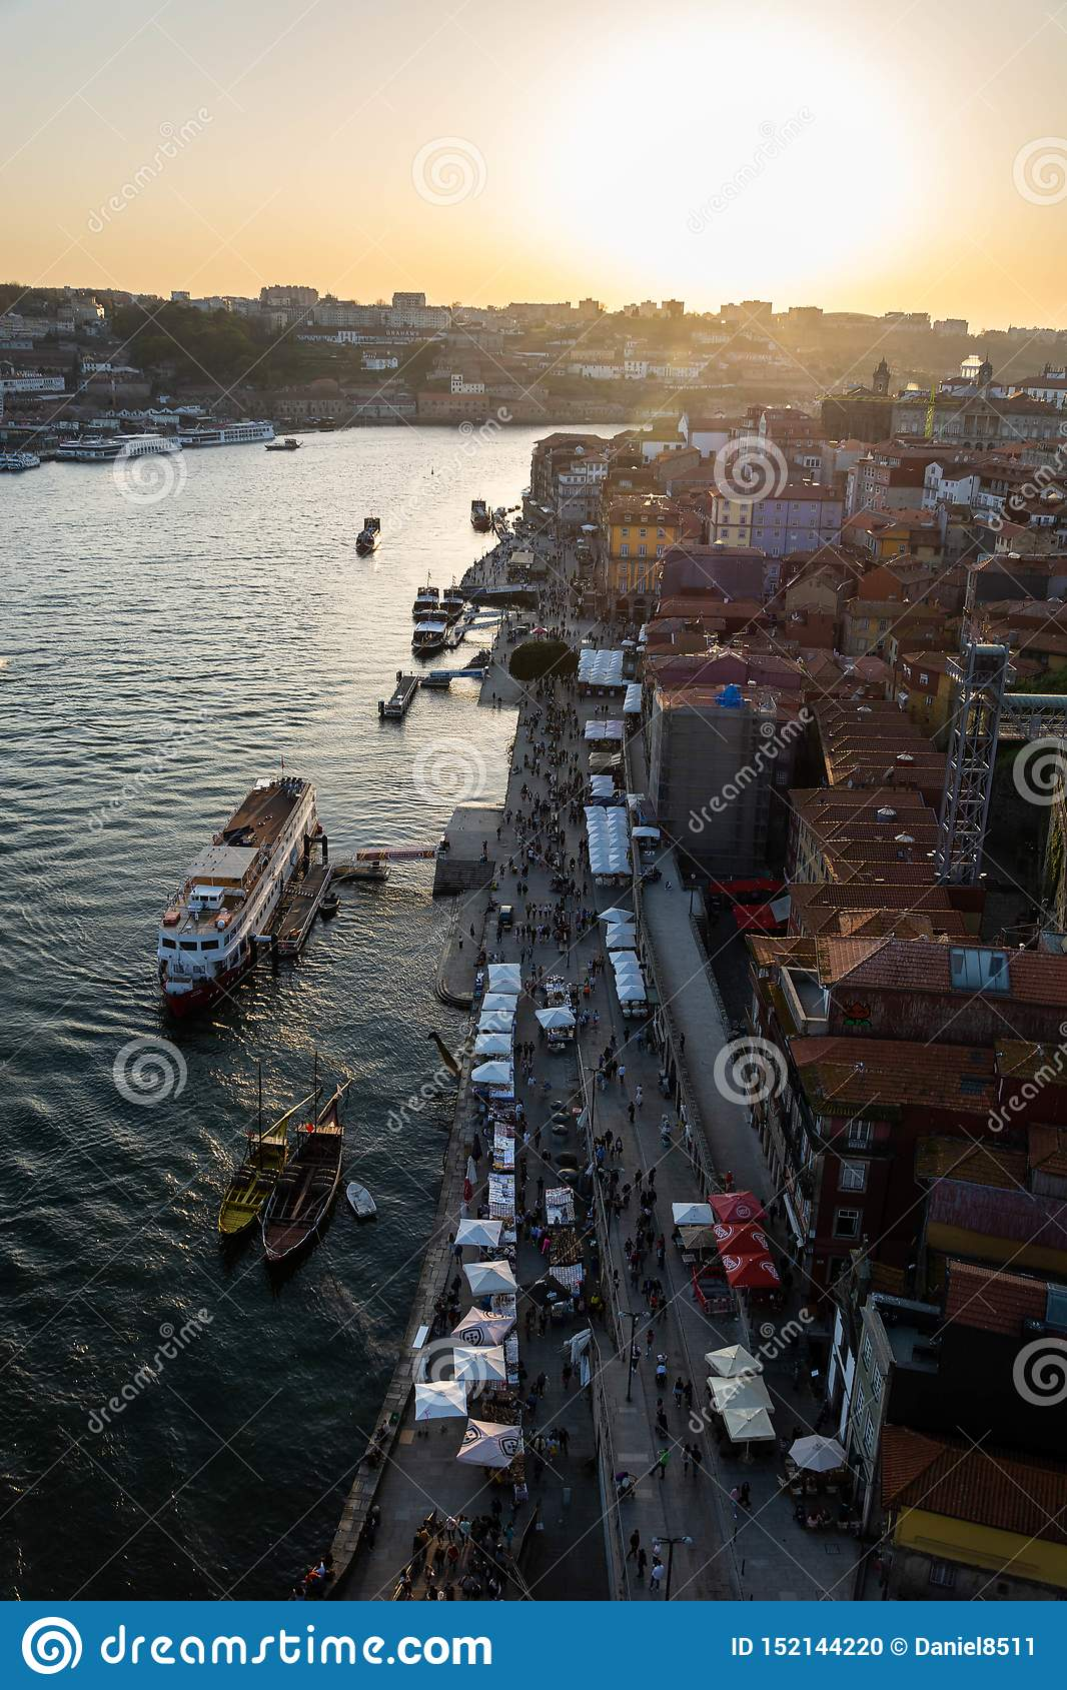 Aerial shot of Ribeira and Douro river, Porto, at sunset